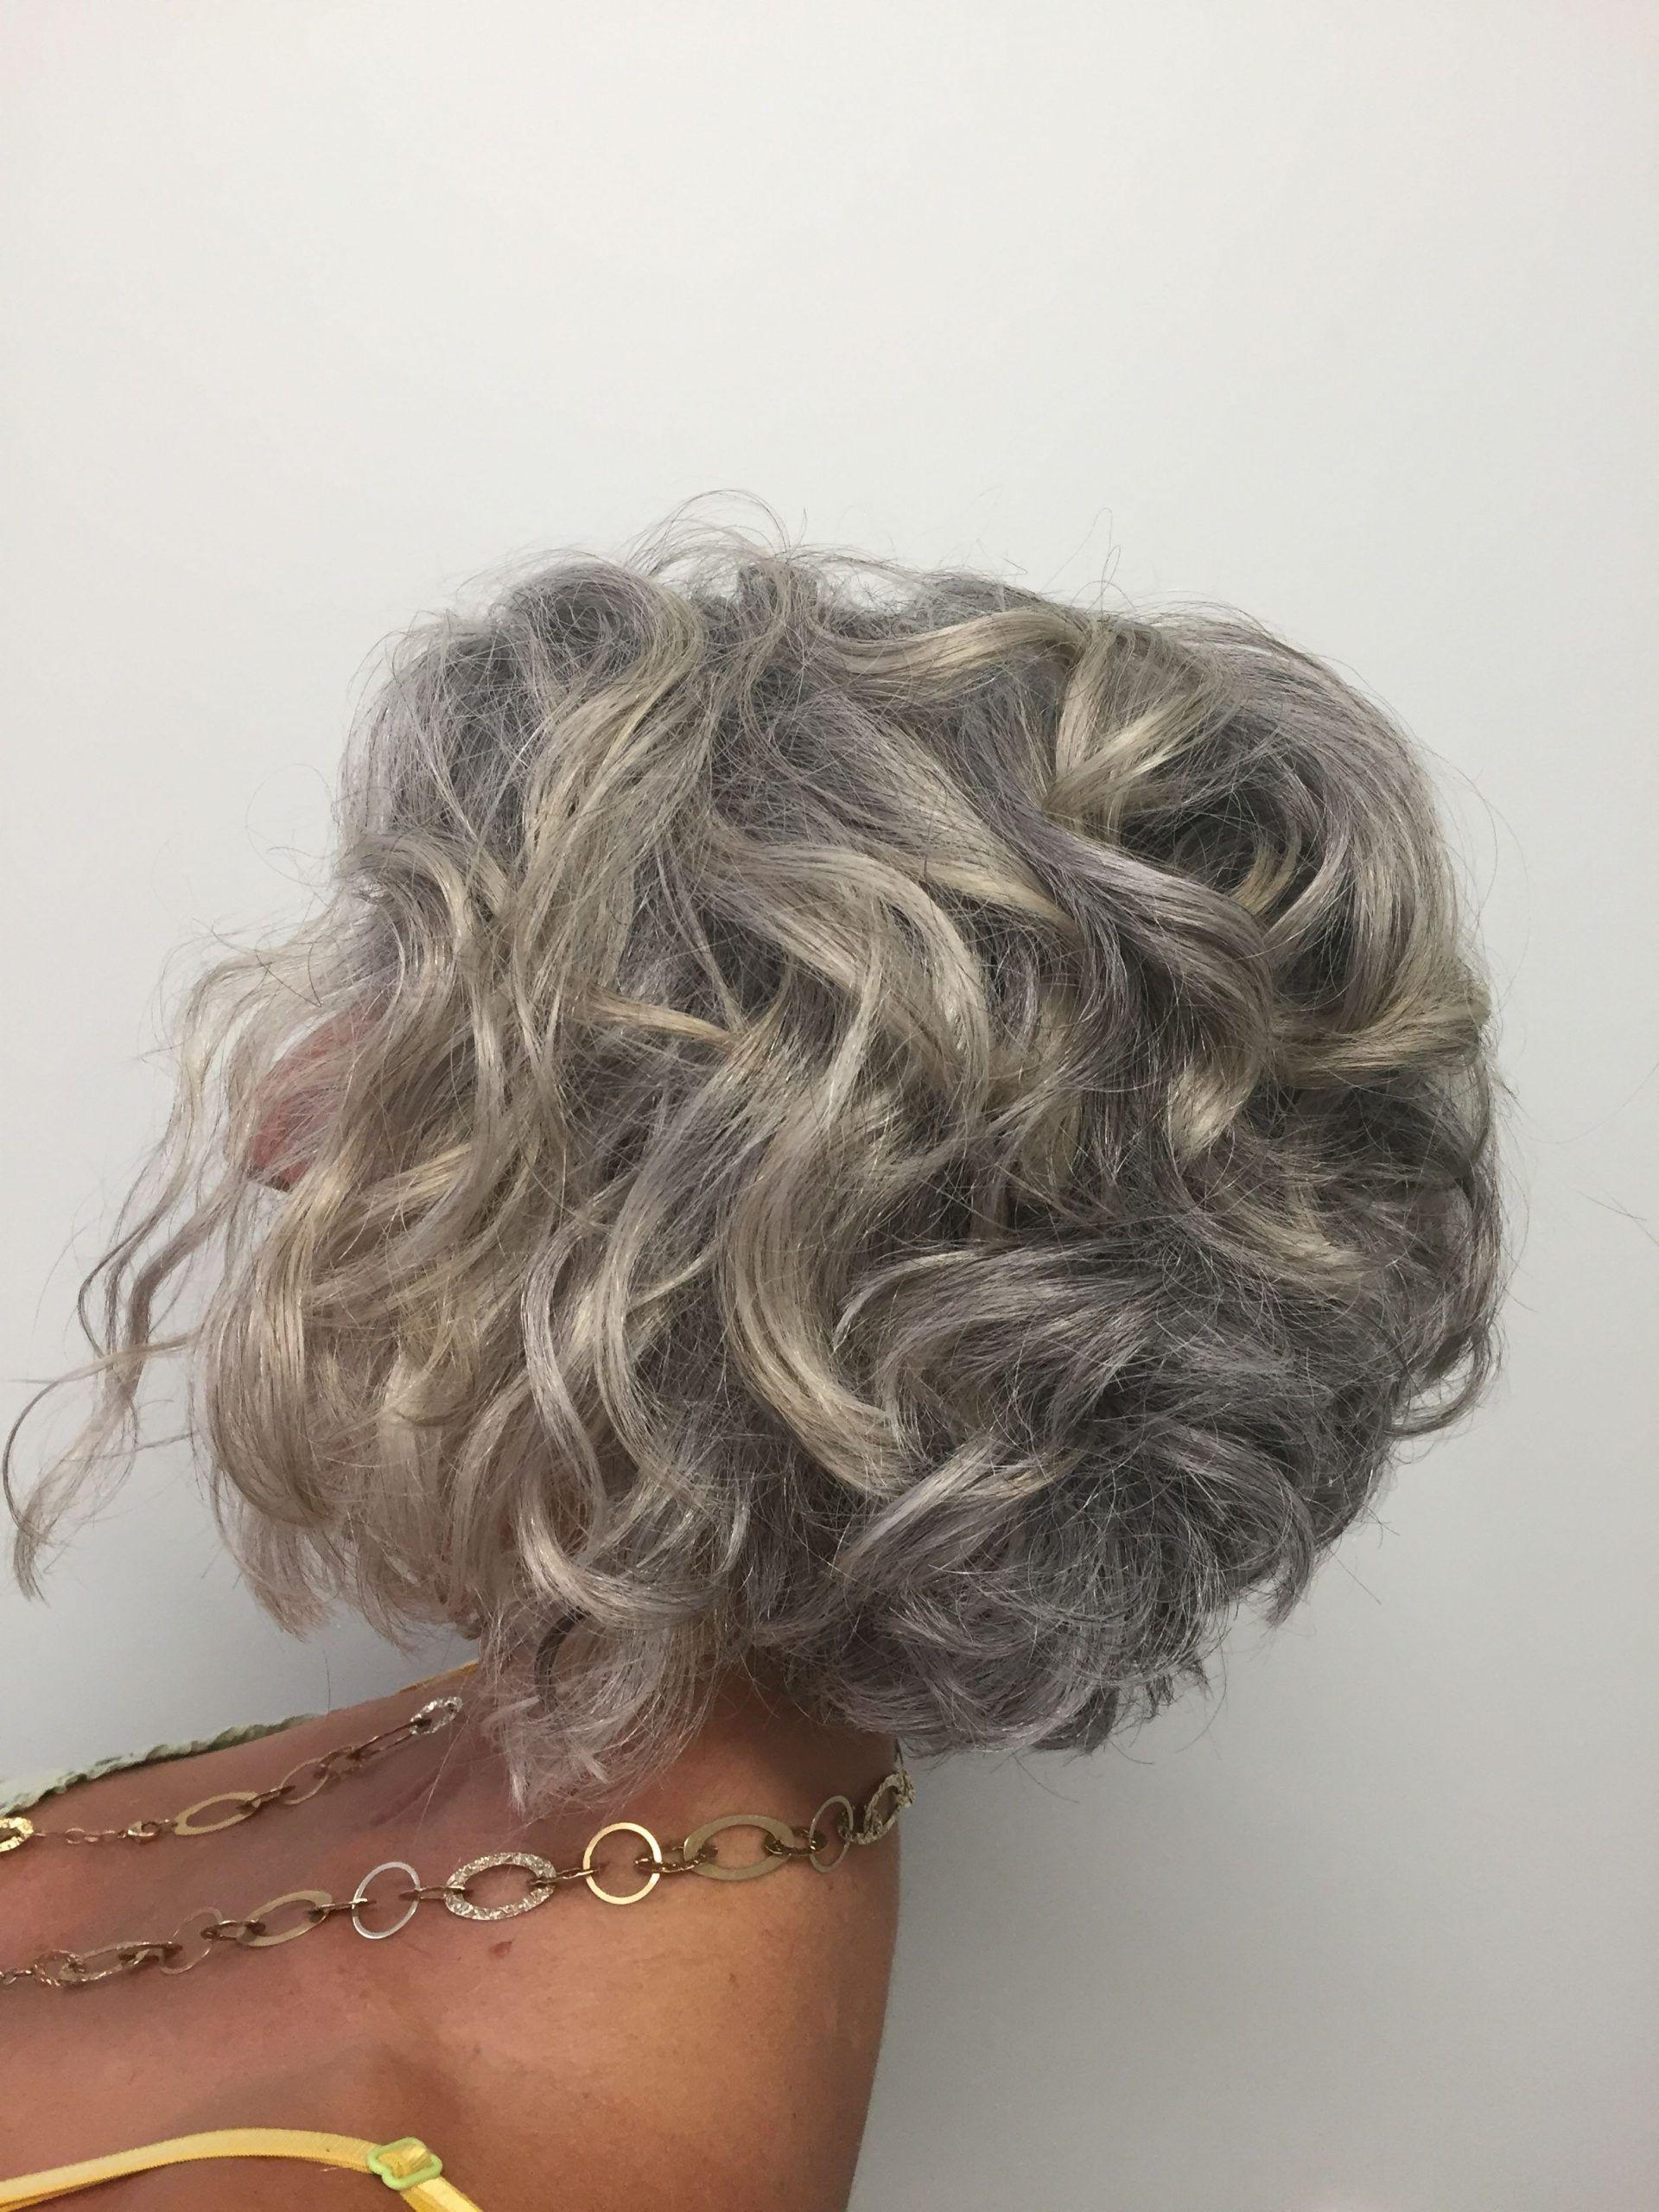 Inspiration Furs Haar Frisur Fur Lockiges Haar 4158 Hairstyles Vogued Lockige Kurze Bobs Graue Haare Lockiges Graues Haar